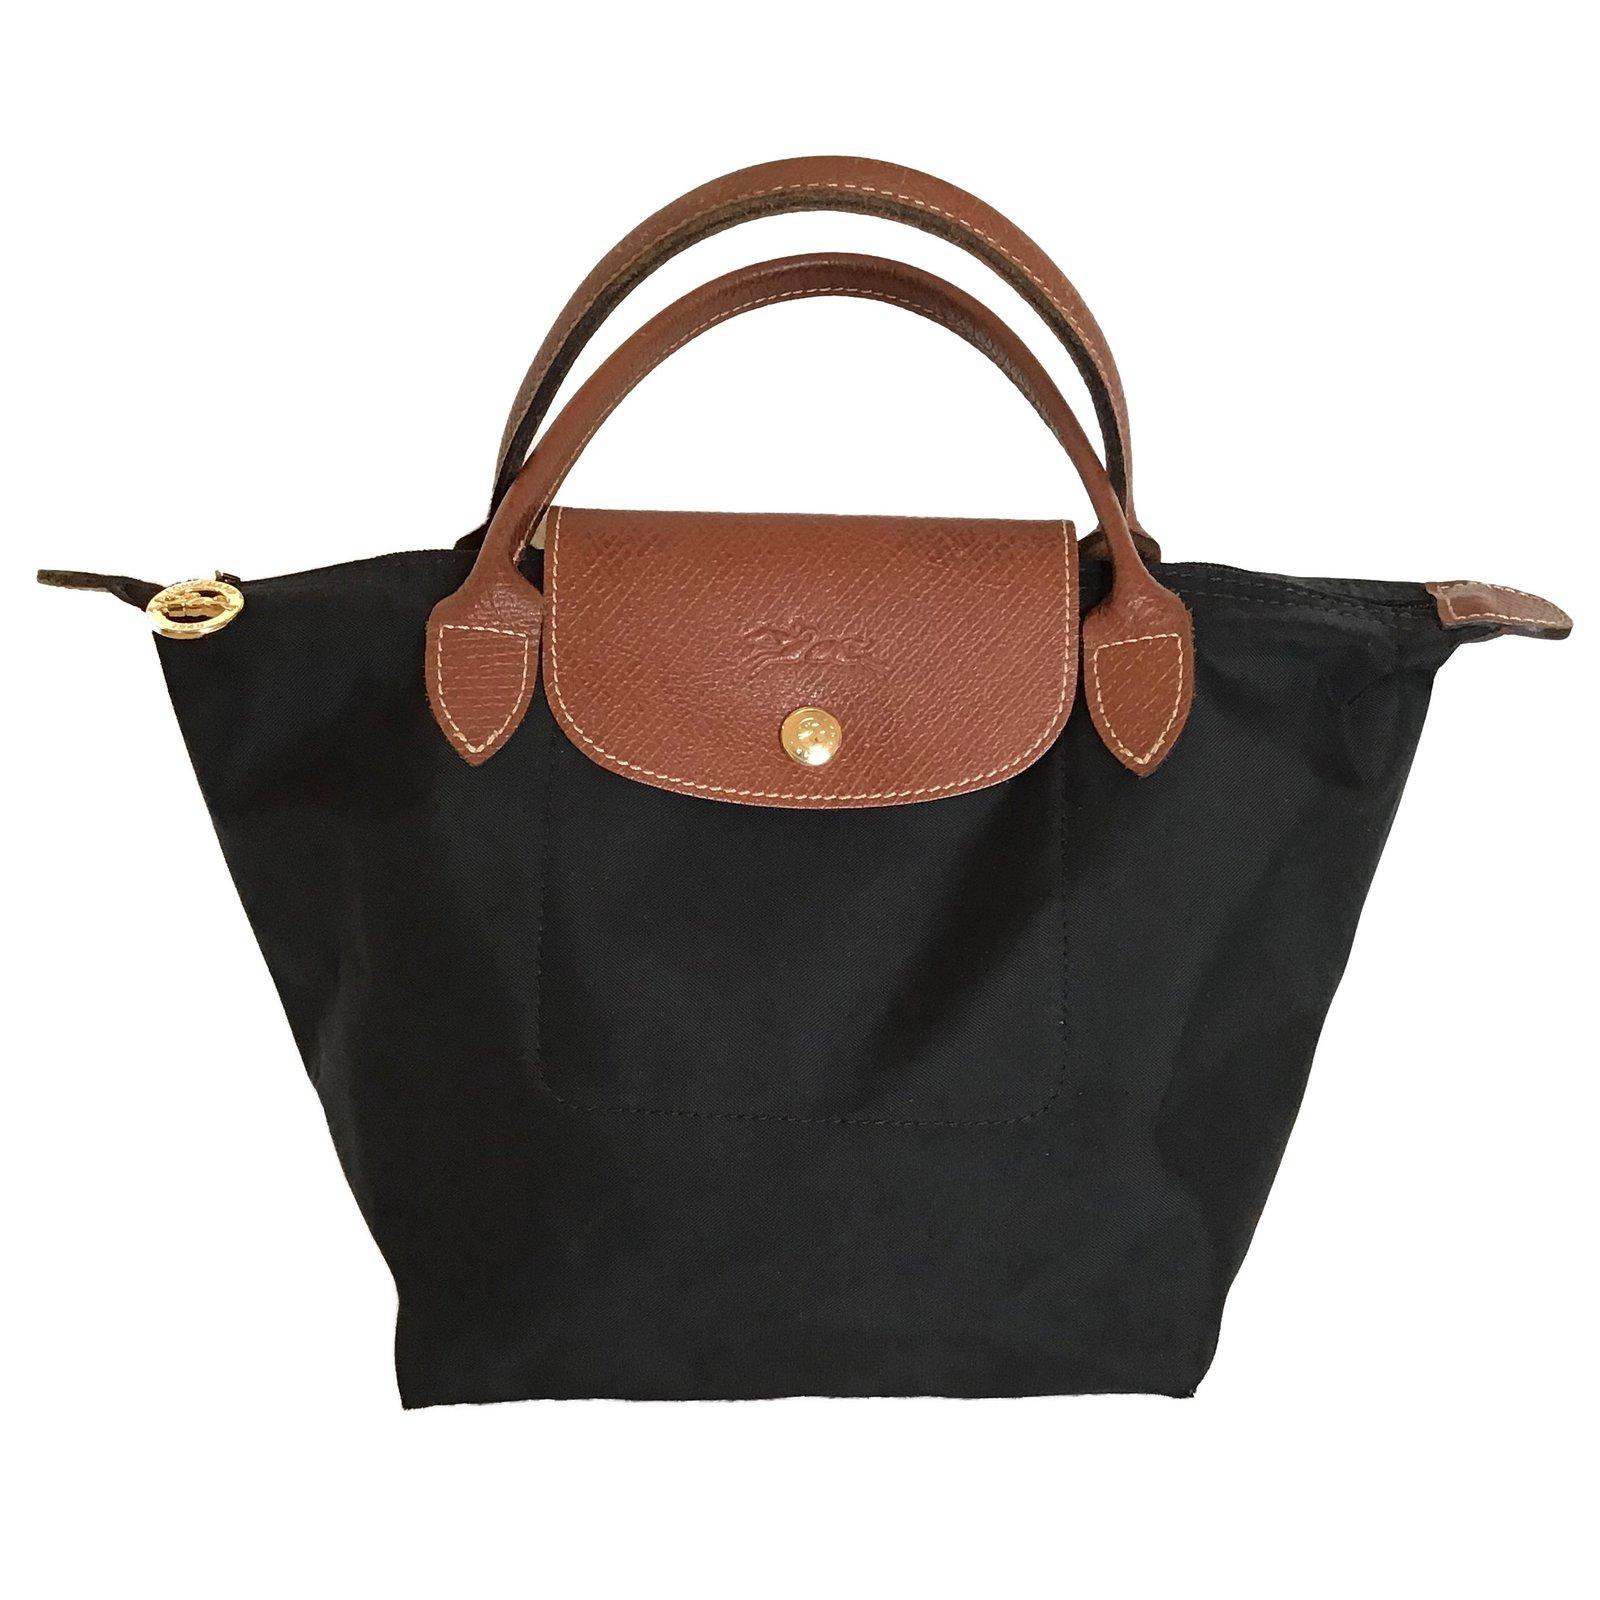 6e37fe845 Longchamp Handbags Handbags Leather,Nylon Brown,Black ref.79592 ...